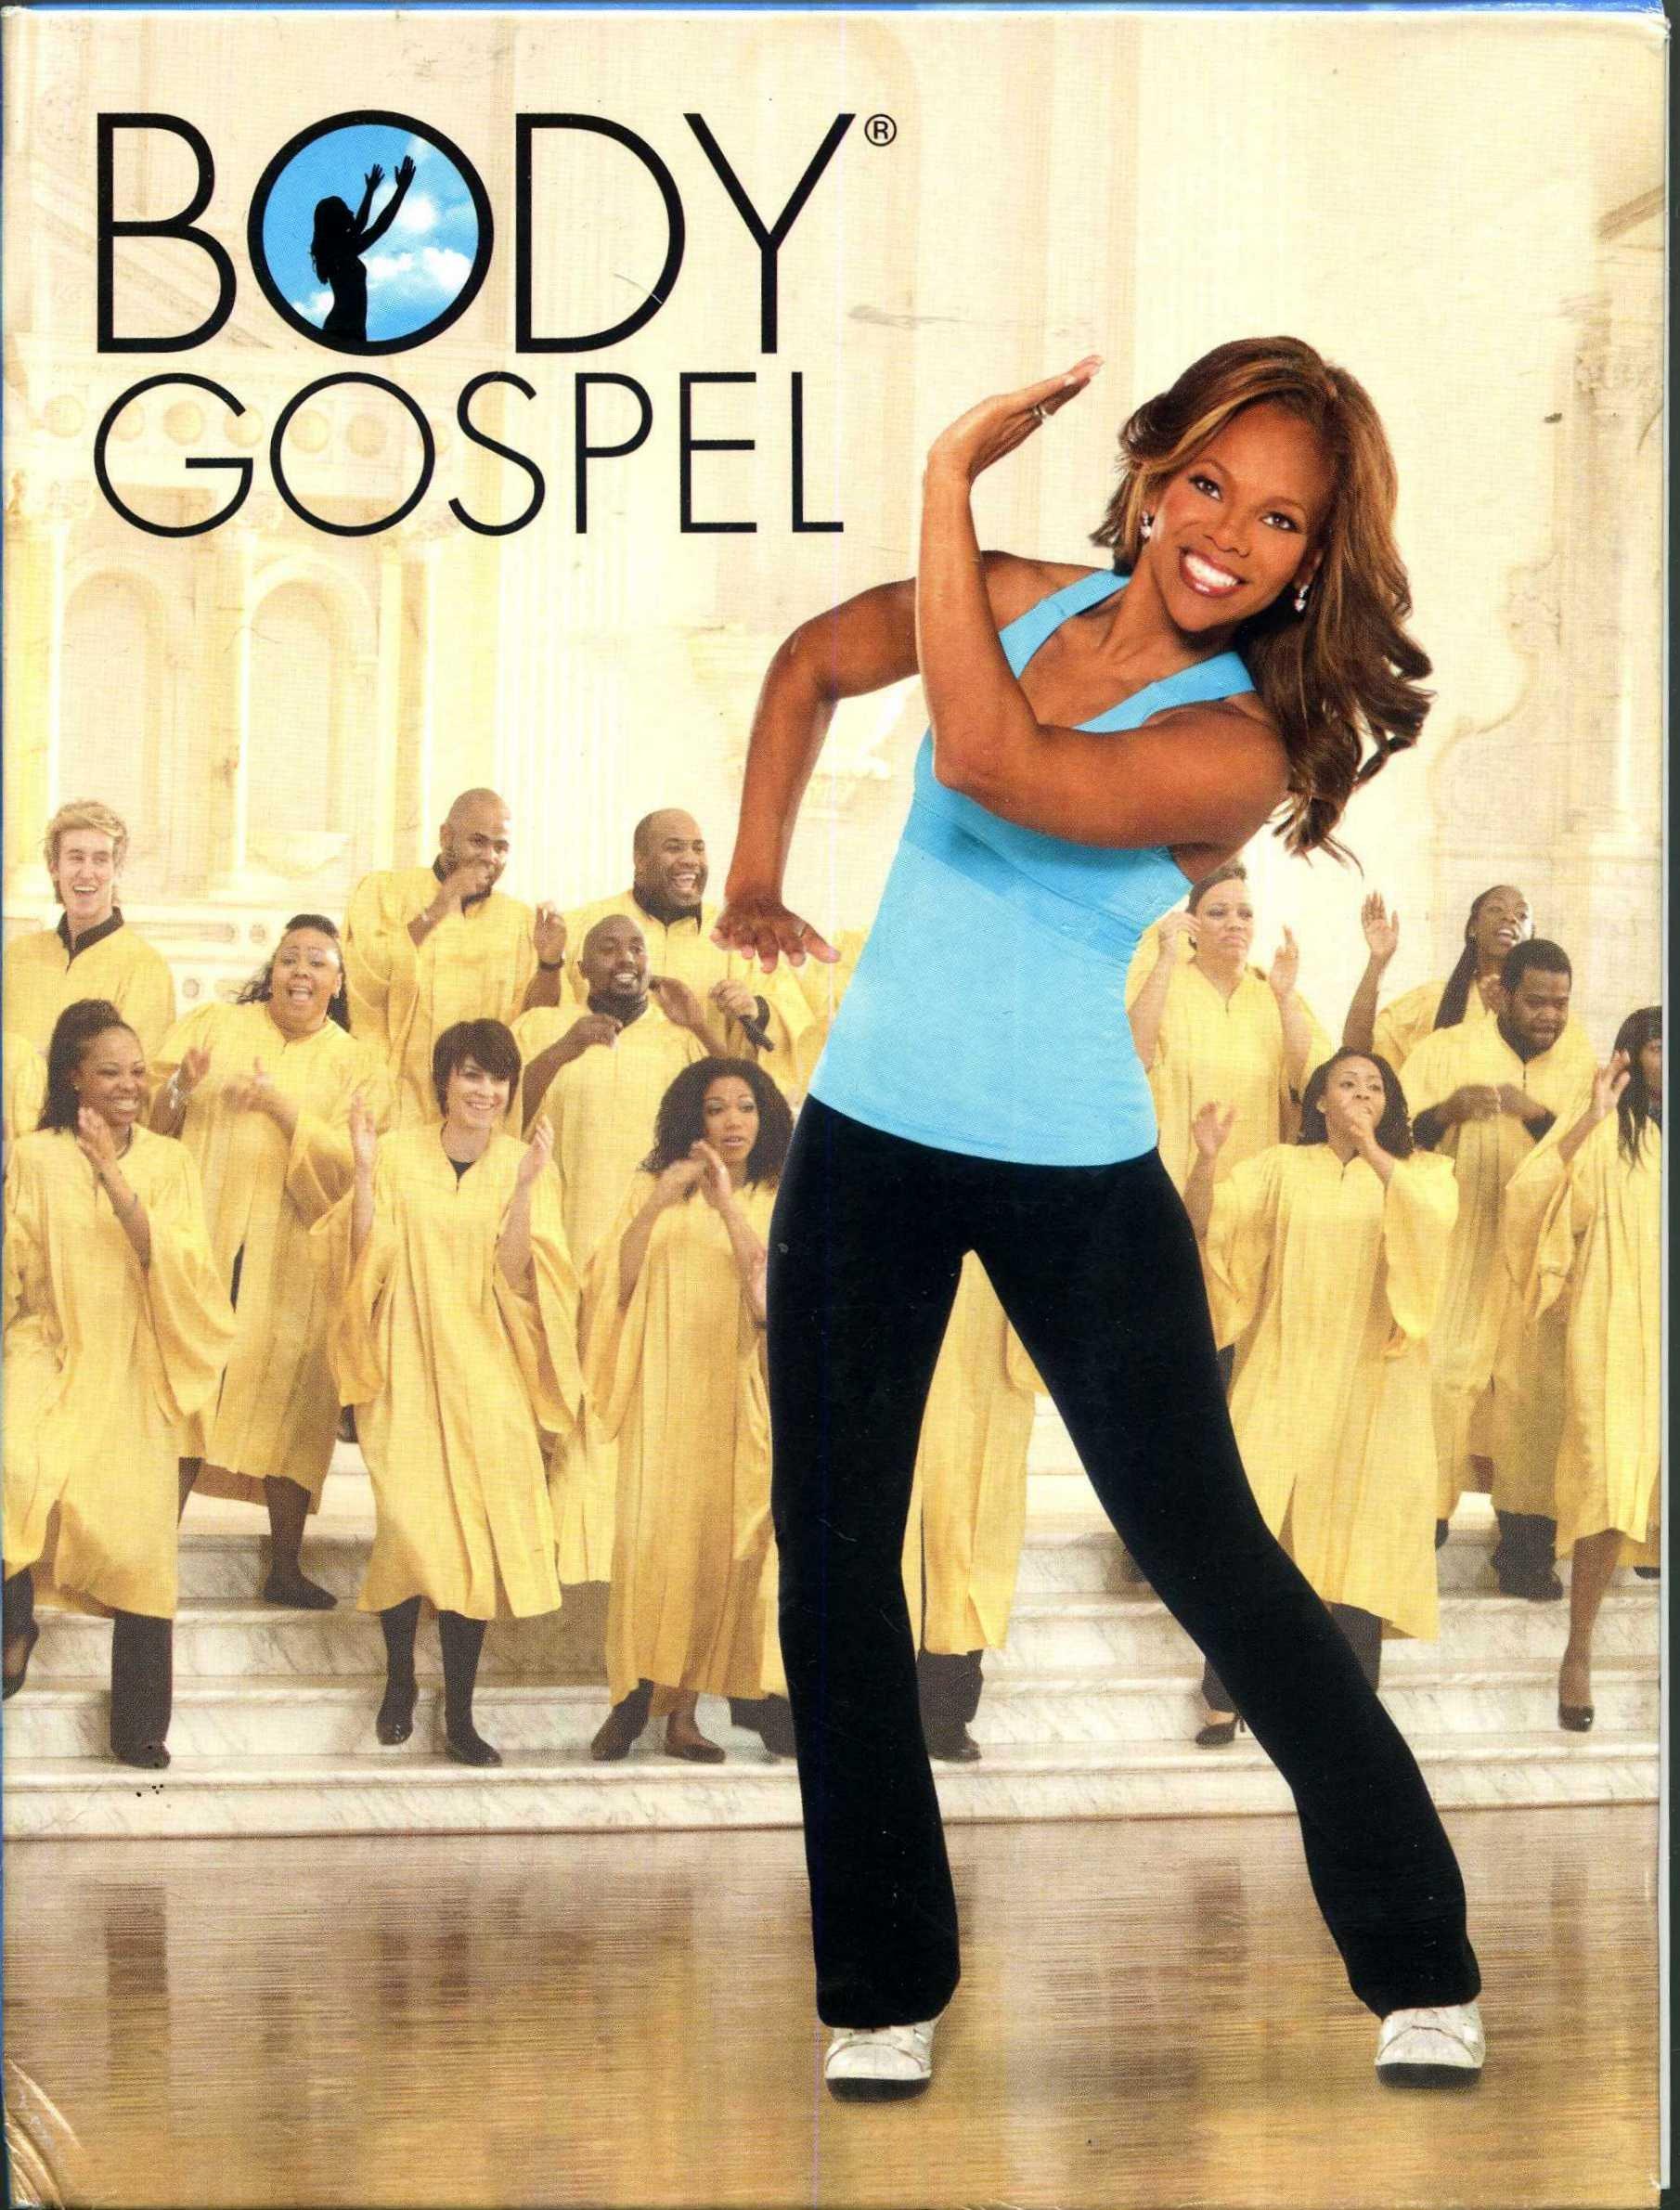 BODY GOSPEL DVD BOX SET by Body Gospel